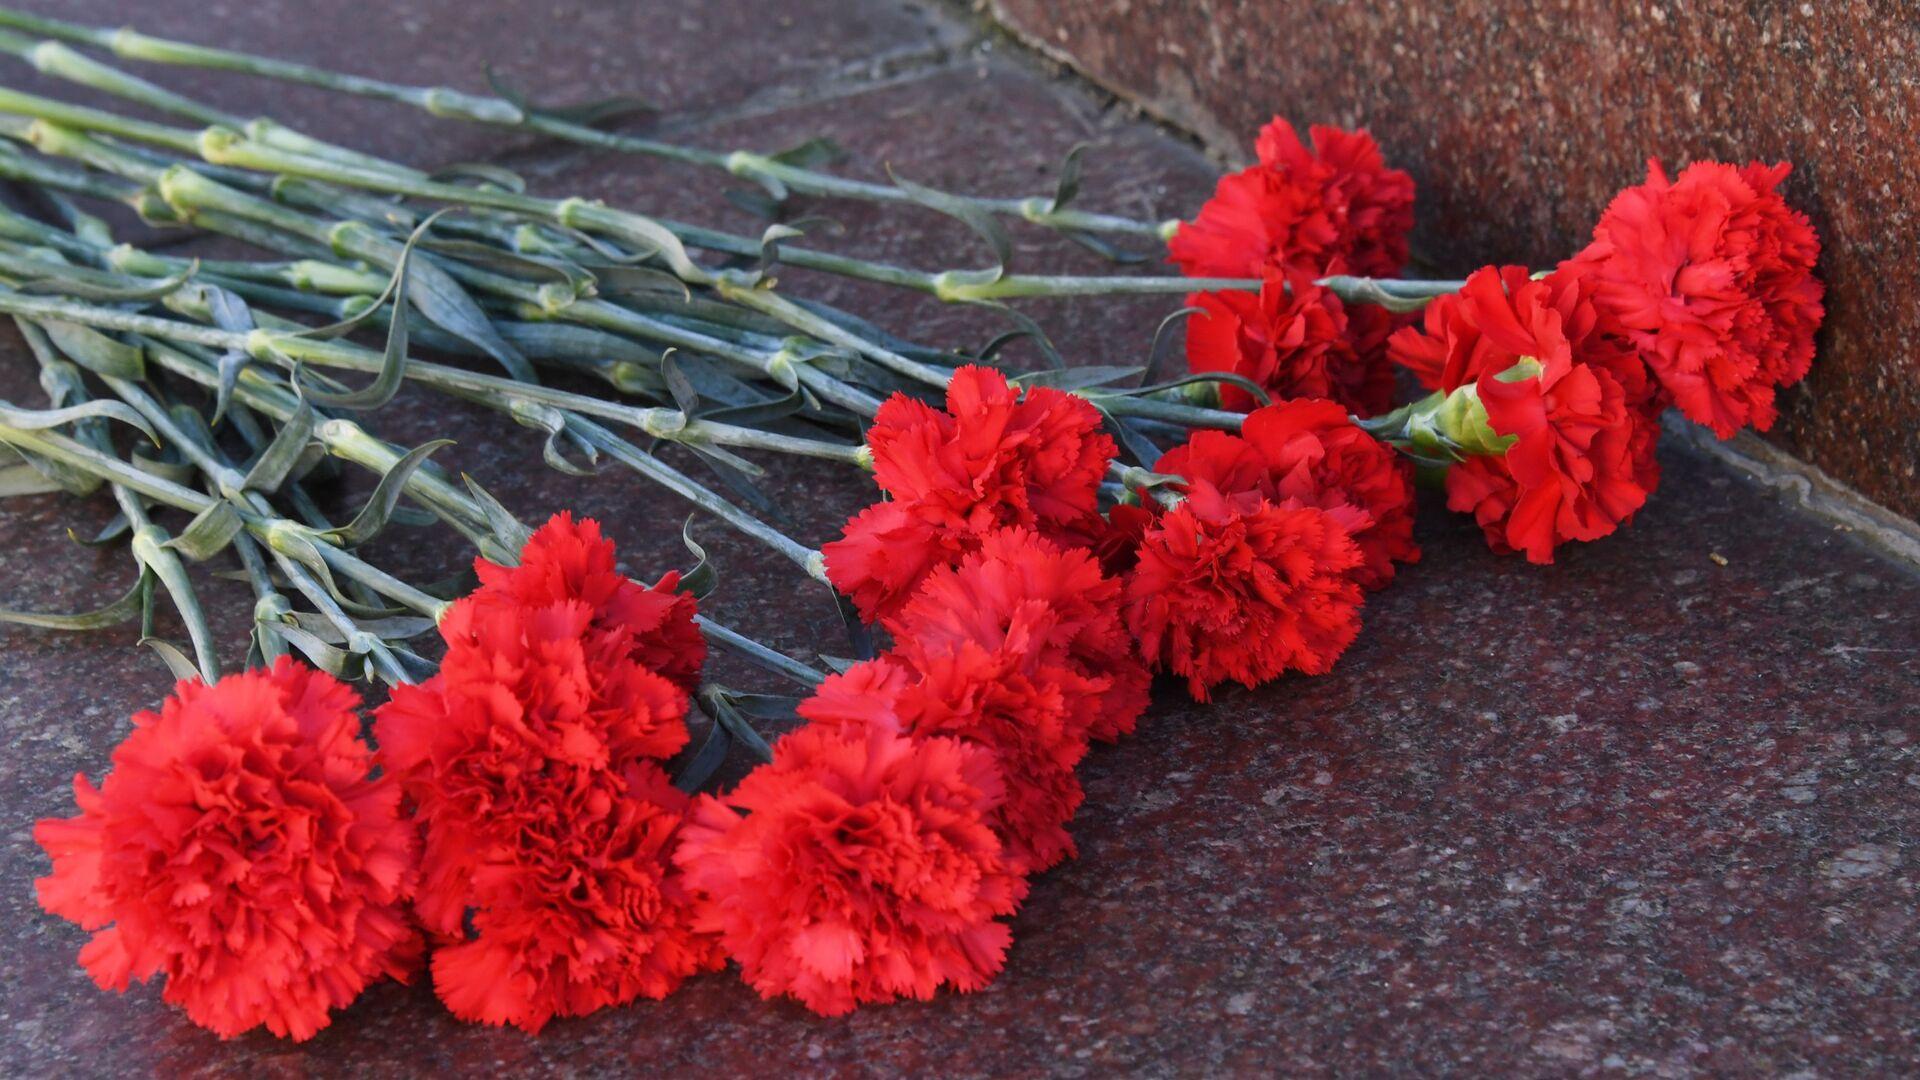 Акции памяти о погибших при нападении на колледж в Керчи - Sputnik Таджикистан, 1920, 28.09.2021